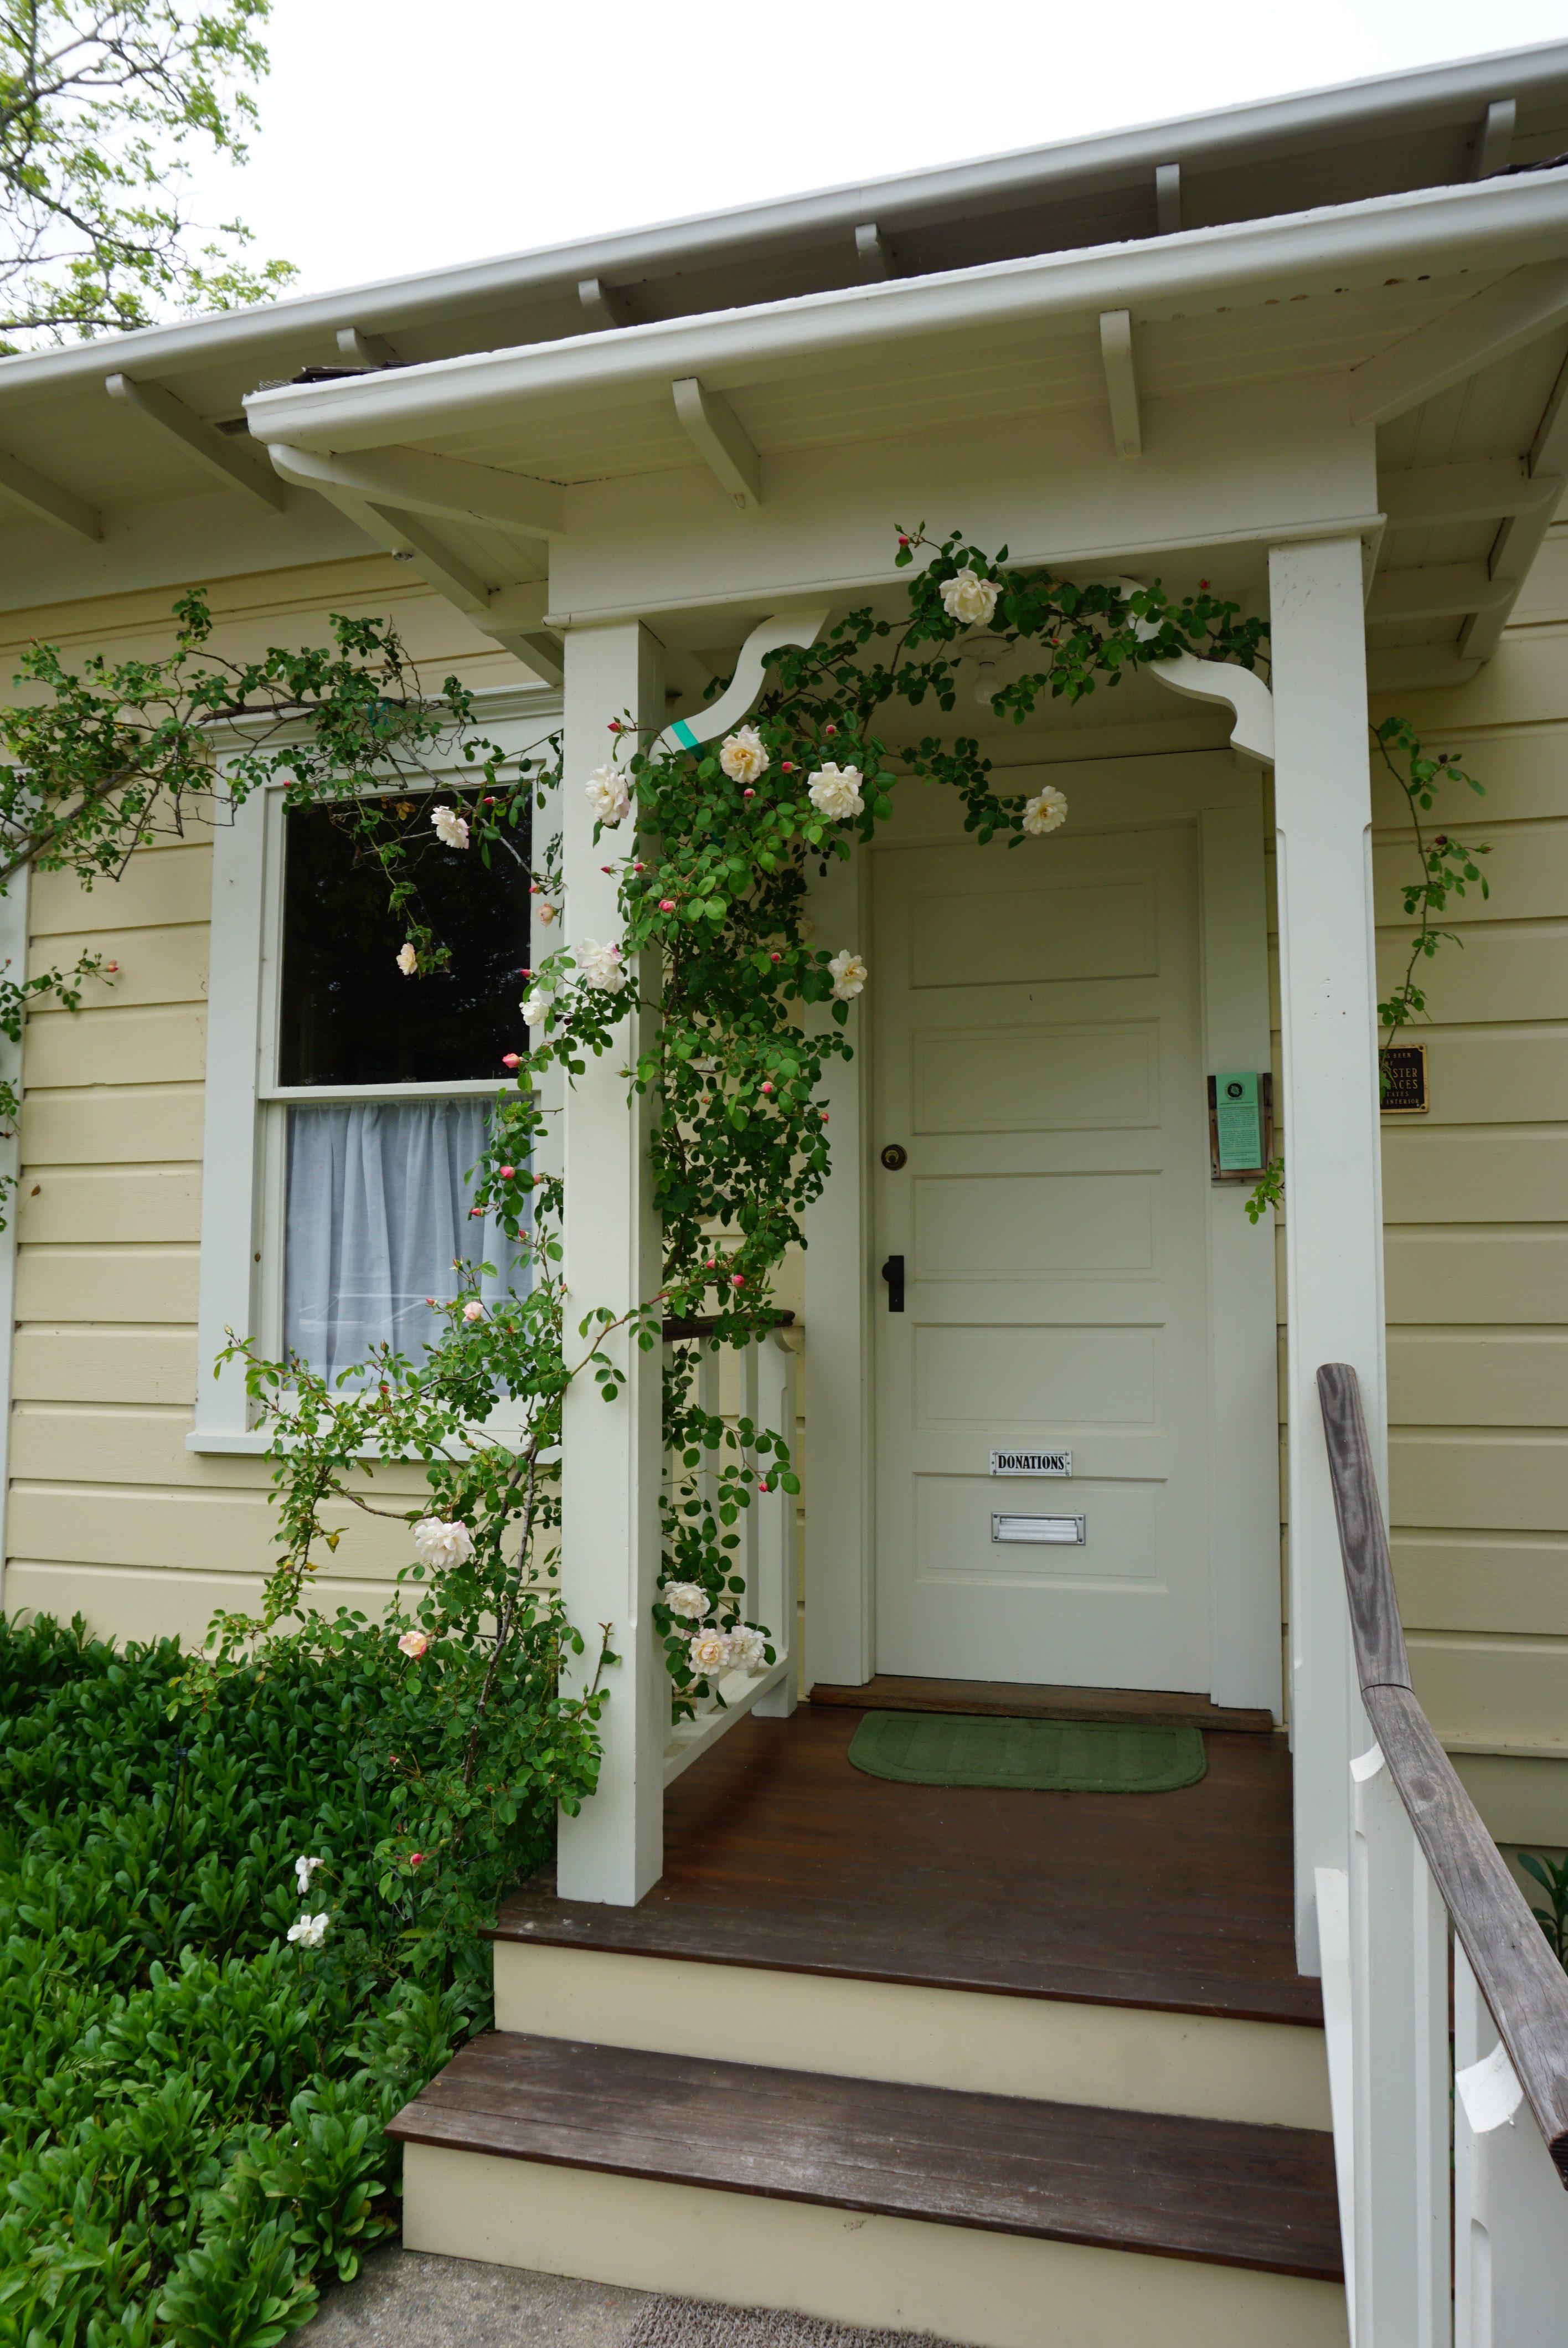 Luther Burbank house, Sebastopol, California